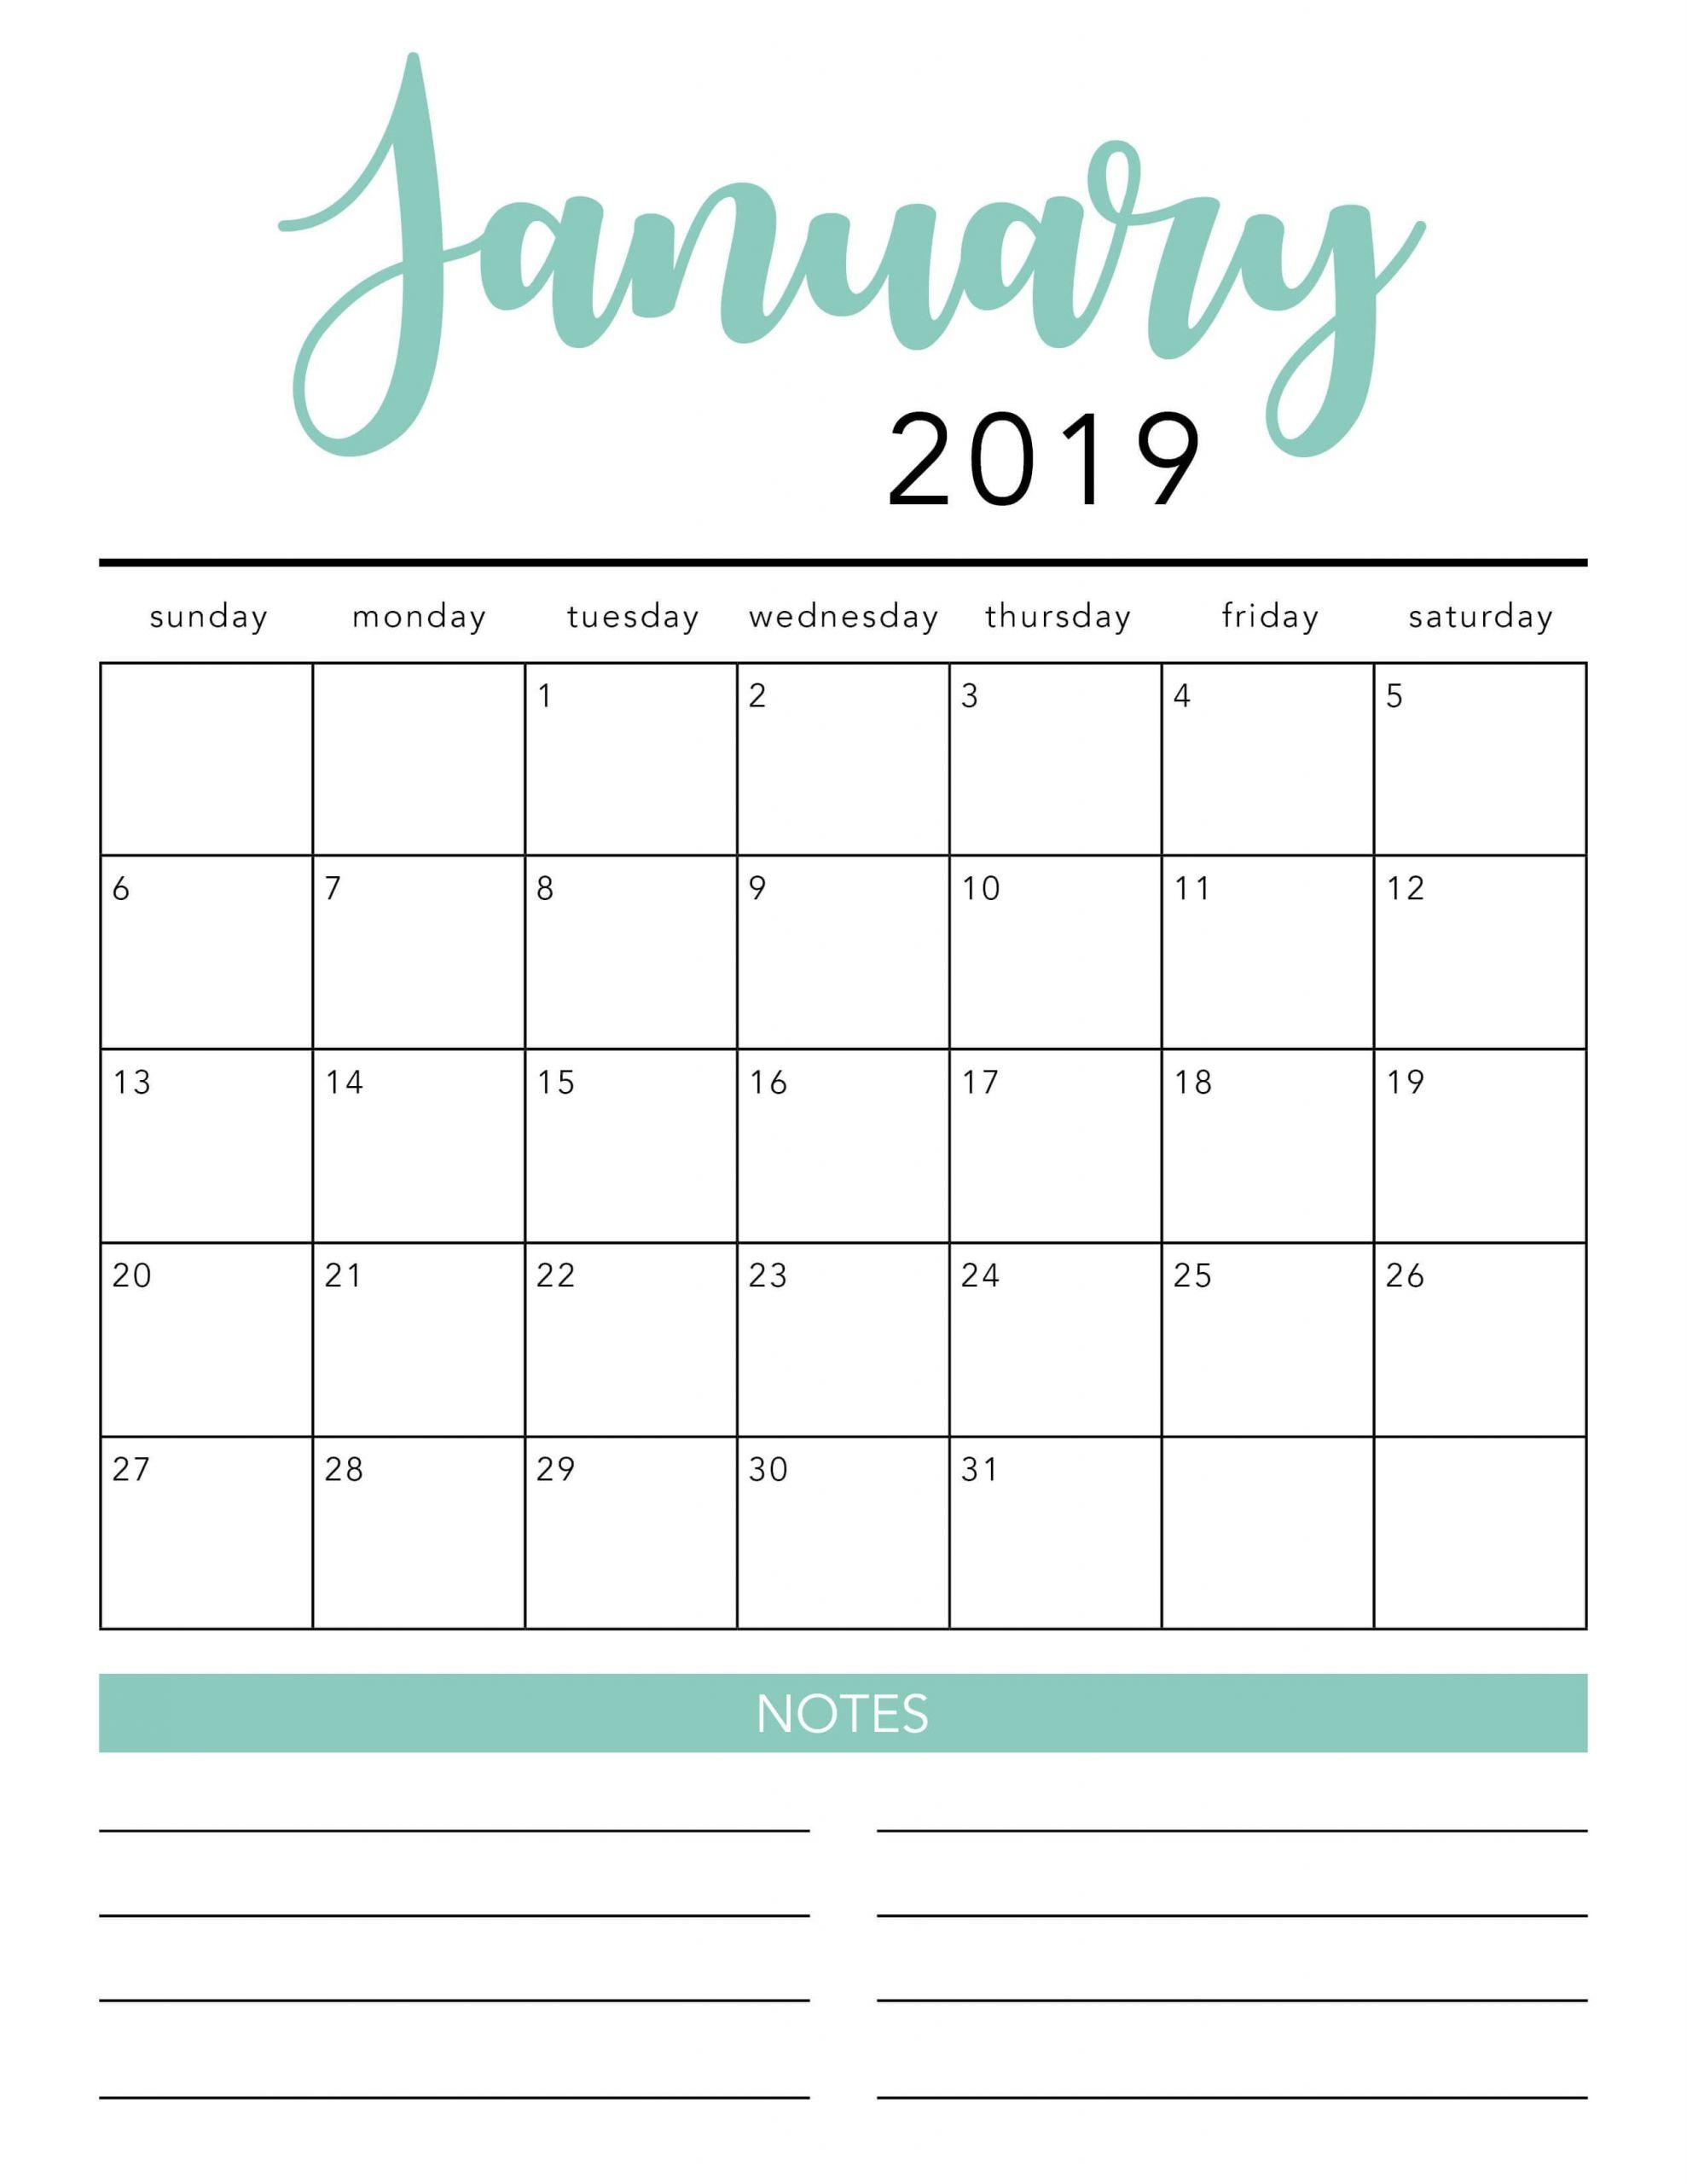 FREE 2021 Printable Calendar Template 2 colors I Heart